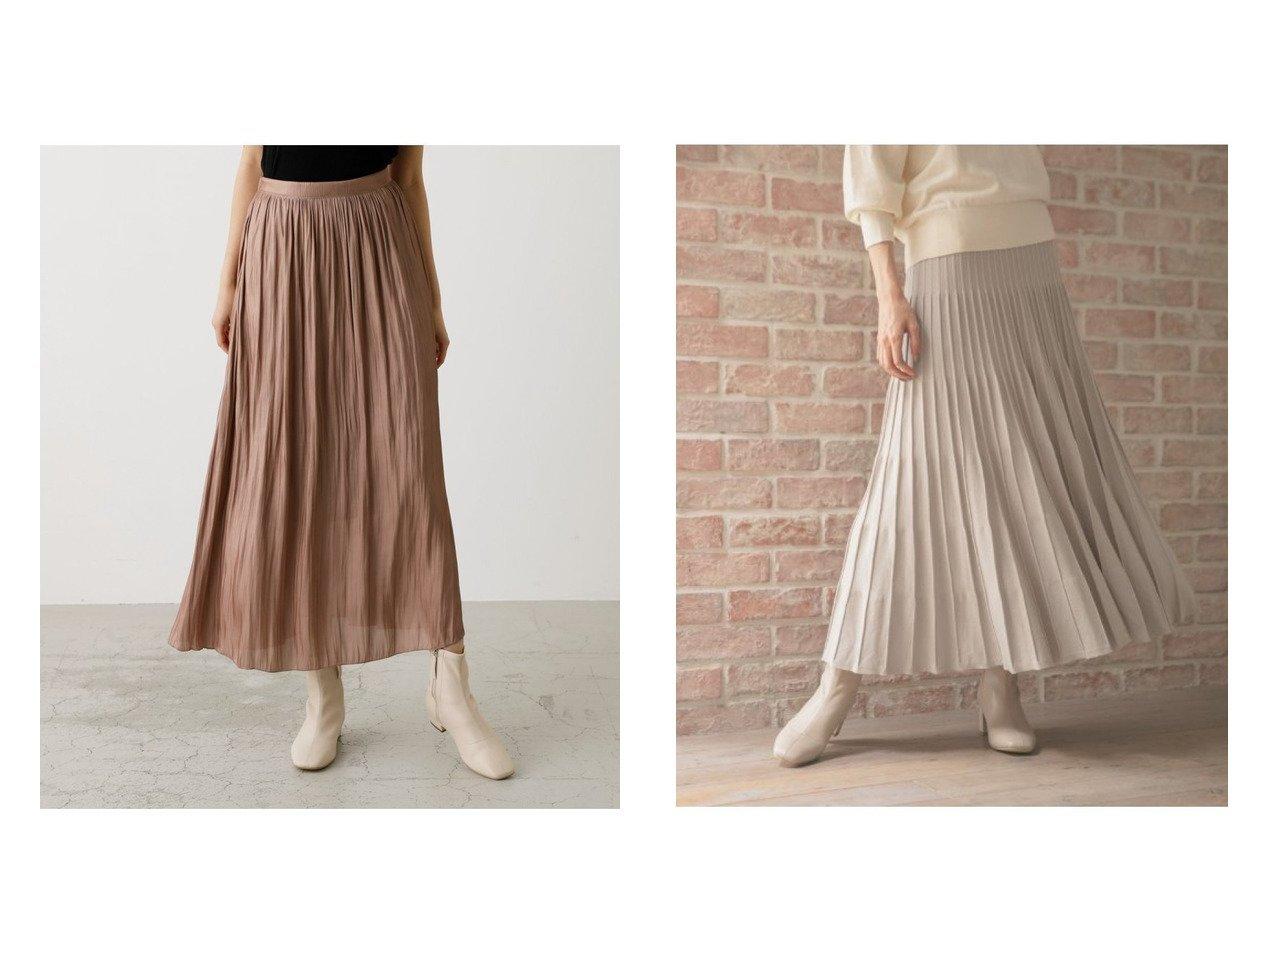 【GLOBAL WORK/グローバルワーク】のメルティニットプリーツSK&【AZUL by moussy/アズール バイ マウジー】のシャイニープリーツスカート スカートのおすすめ!人気、レディースファッションの通販 おすすめで人気のファッション通販商品 インテリア・家具・キッズファッション・メンズファッション・レディースファッション・服の通販 founy(ファニー) https://founy.com/ ファッション Fashion レディース WOMEN スカート Skirt プリーツスカート Pleated Skirts シャイニー トレンド パーカー プリーツ ギャザー 秋  ID:crp329100000001548